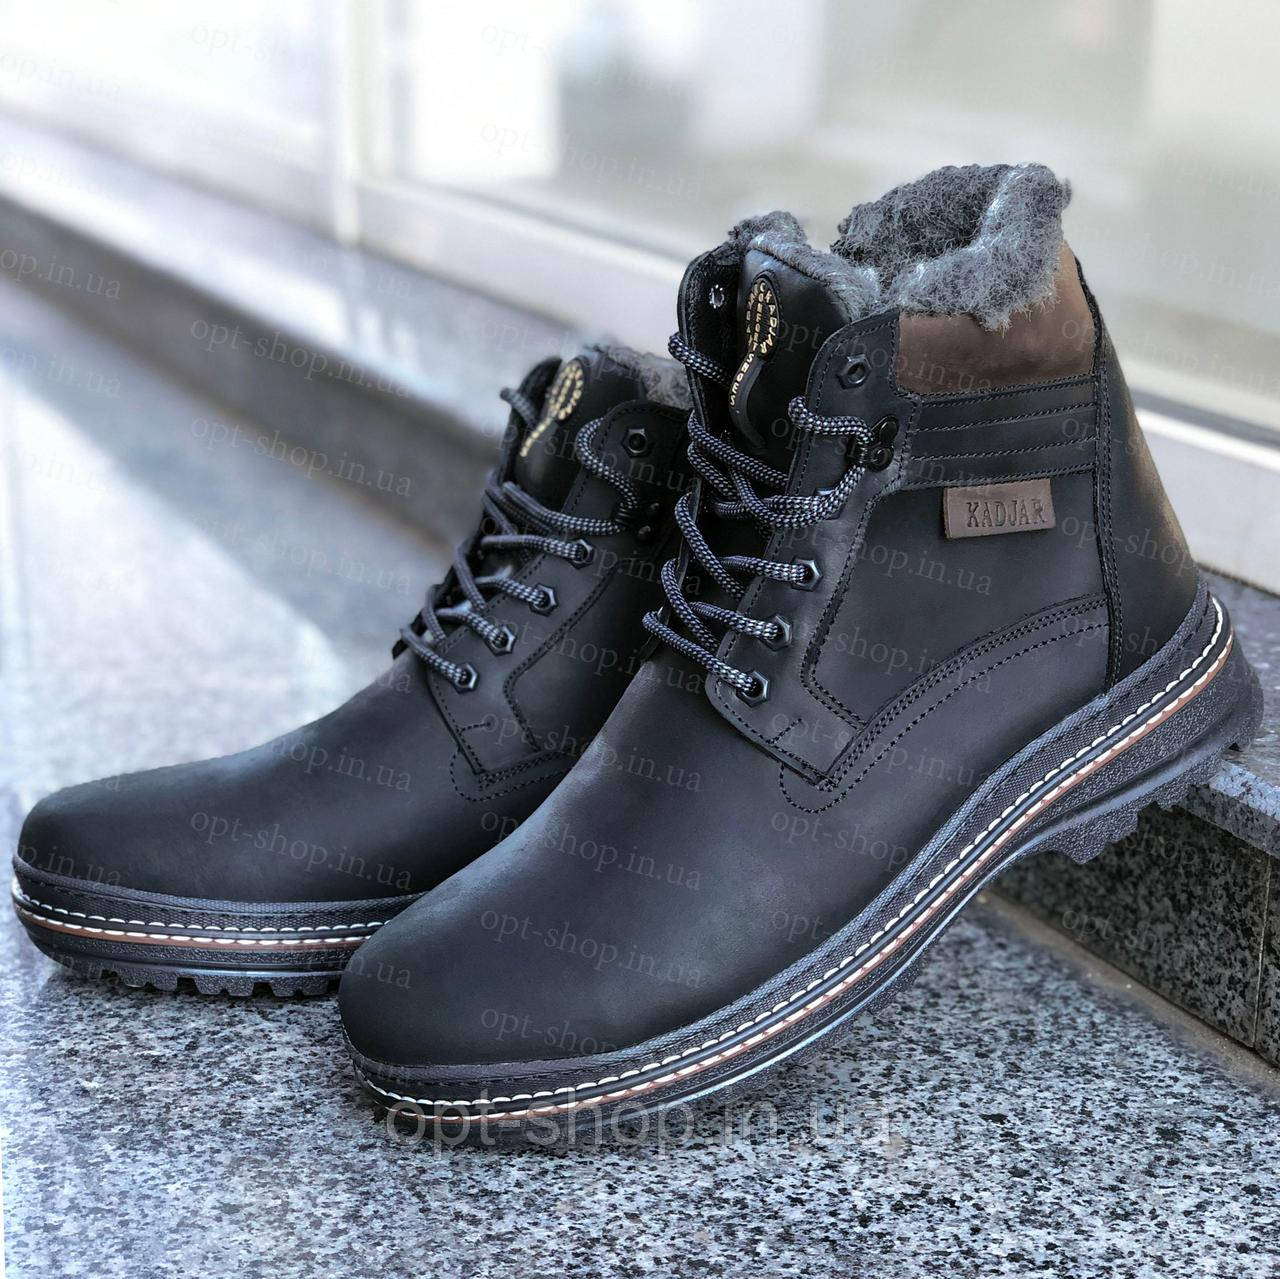 Мужские зимние ботинки большого размера 46-49 кожаные высокие,Зимові чоловічі черевики великого розміру